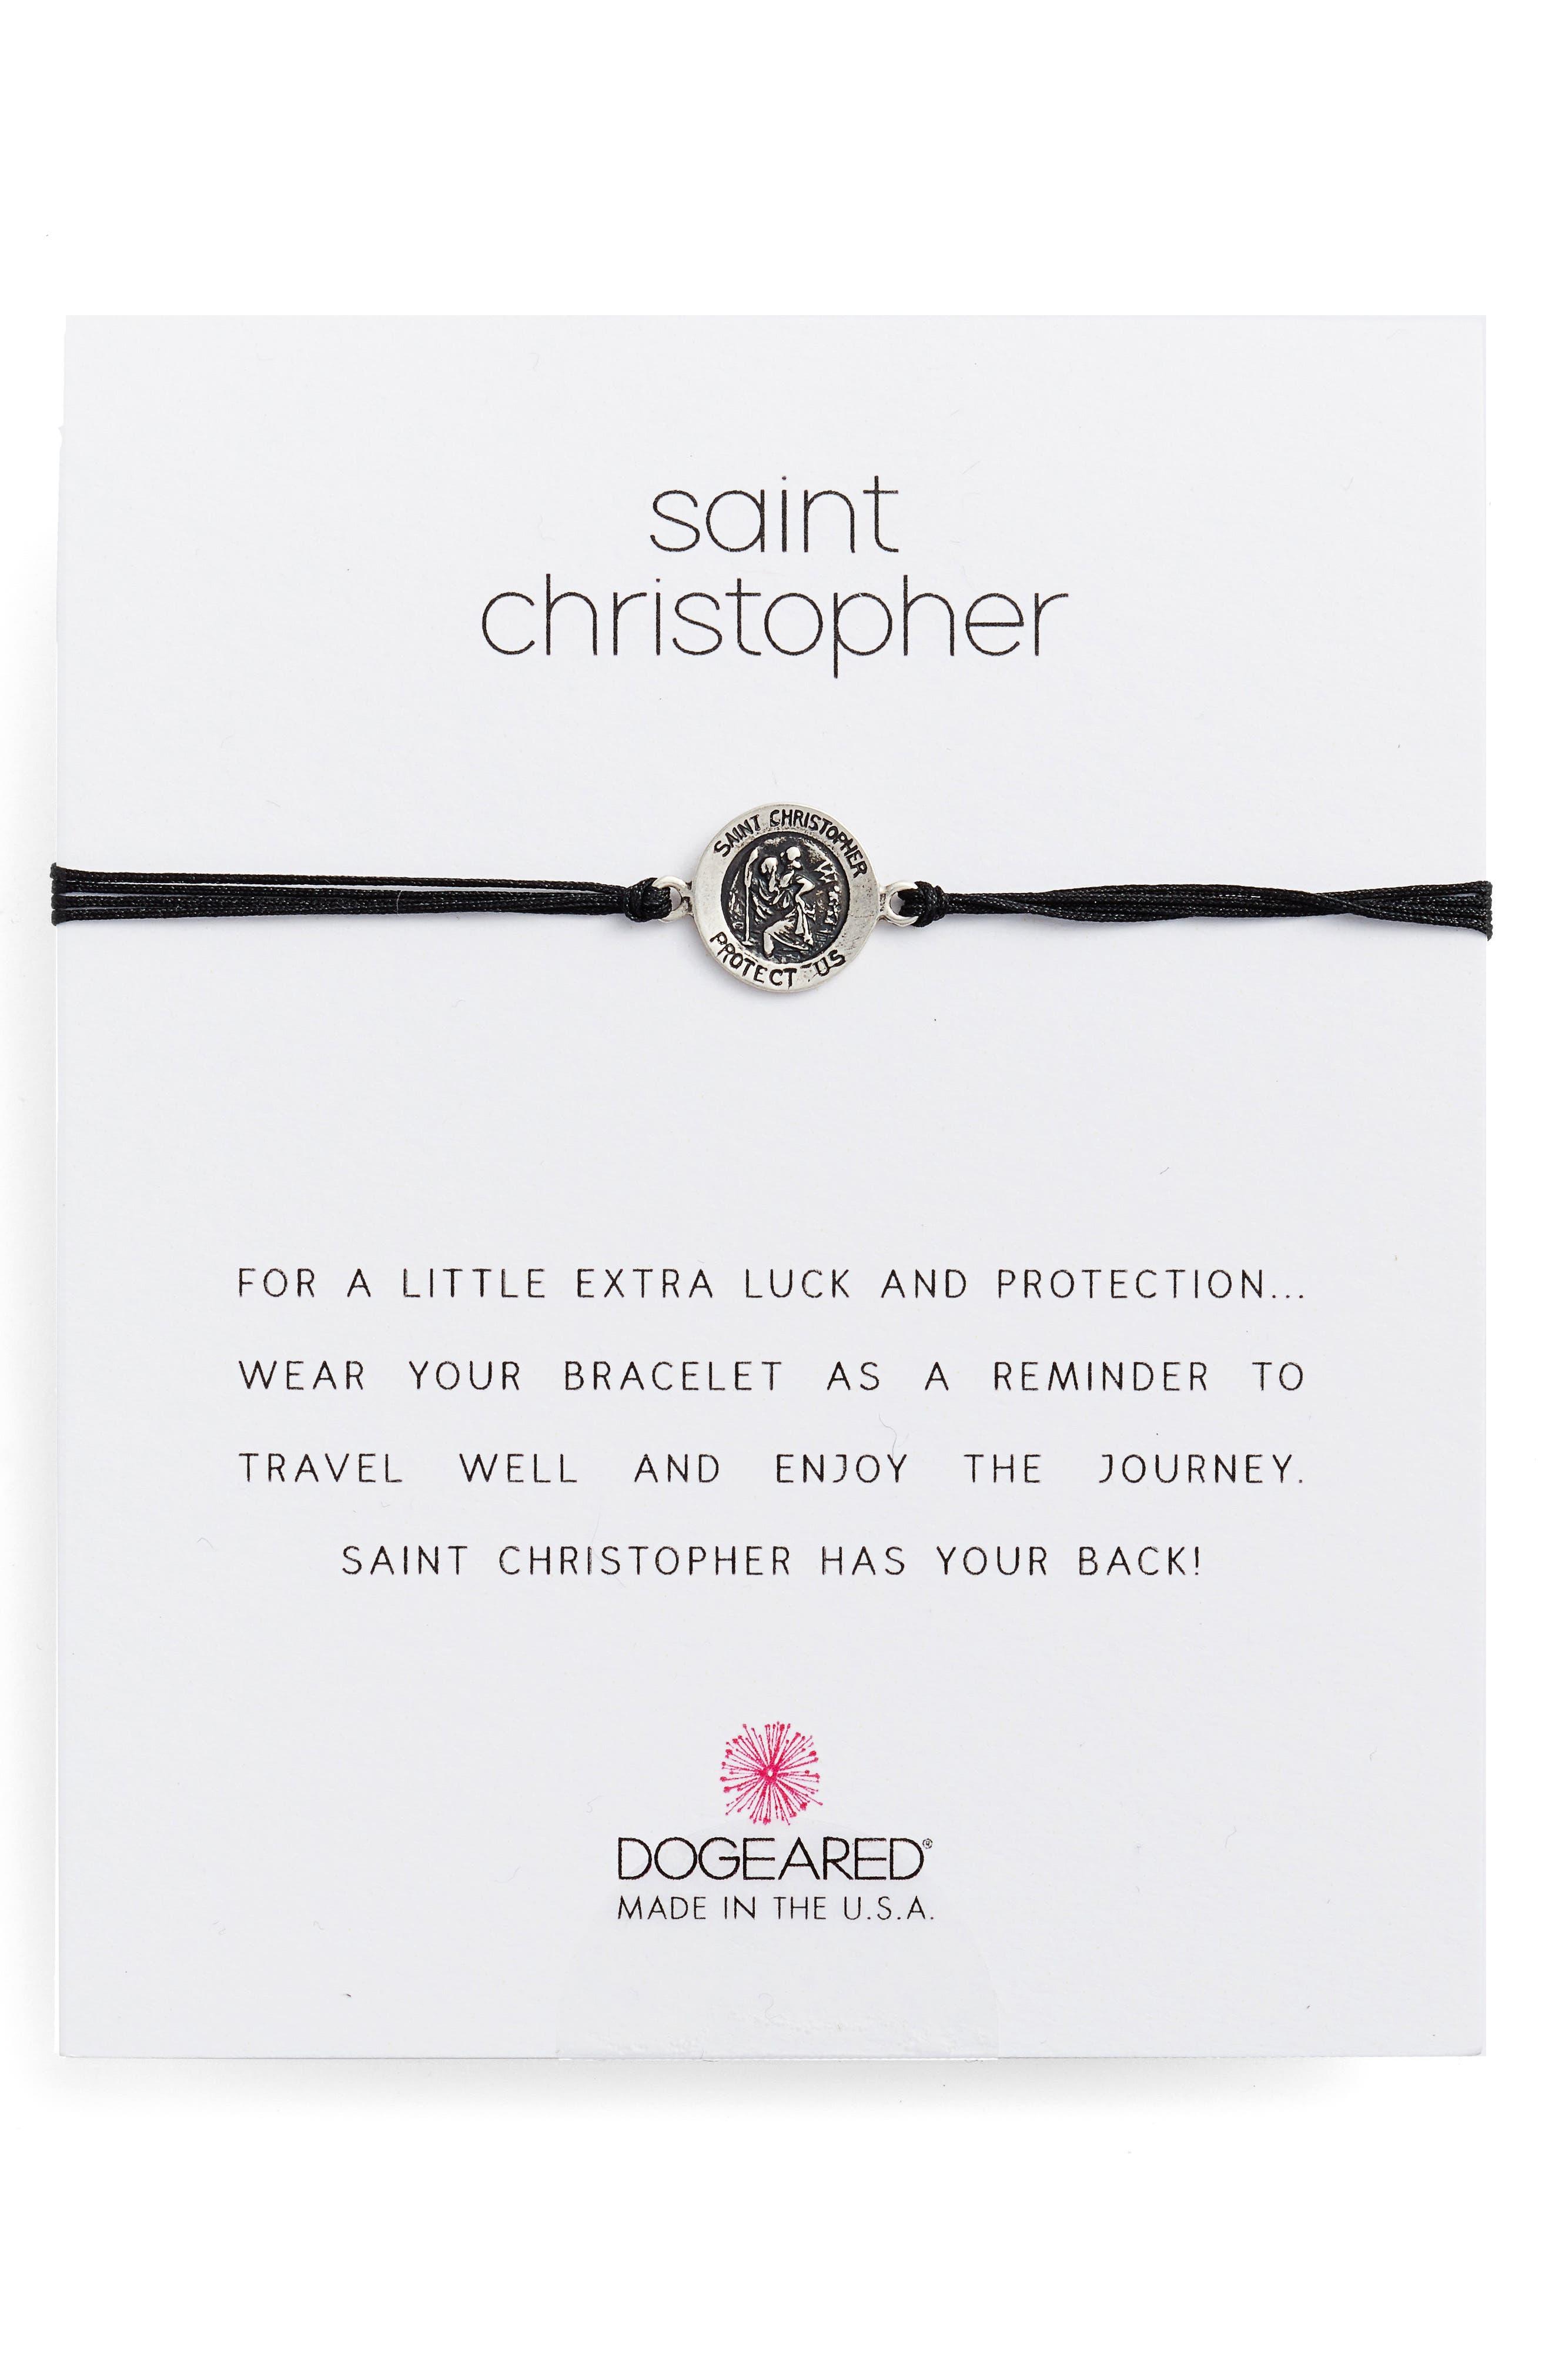 Saint Christopher Pull Bracelet,                             Main thumbnail 1, color,                             Black/ Silver